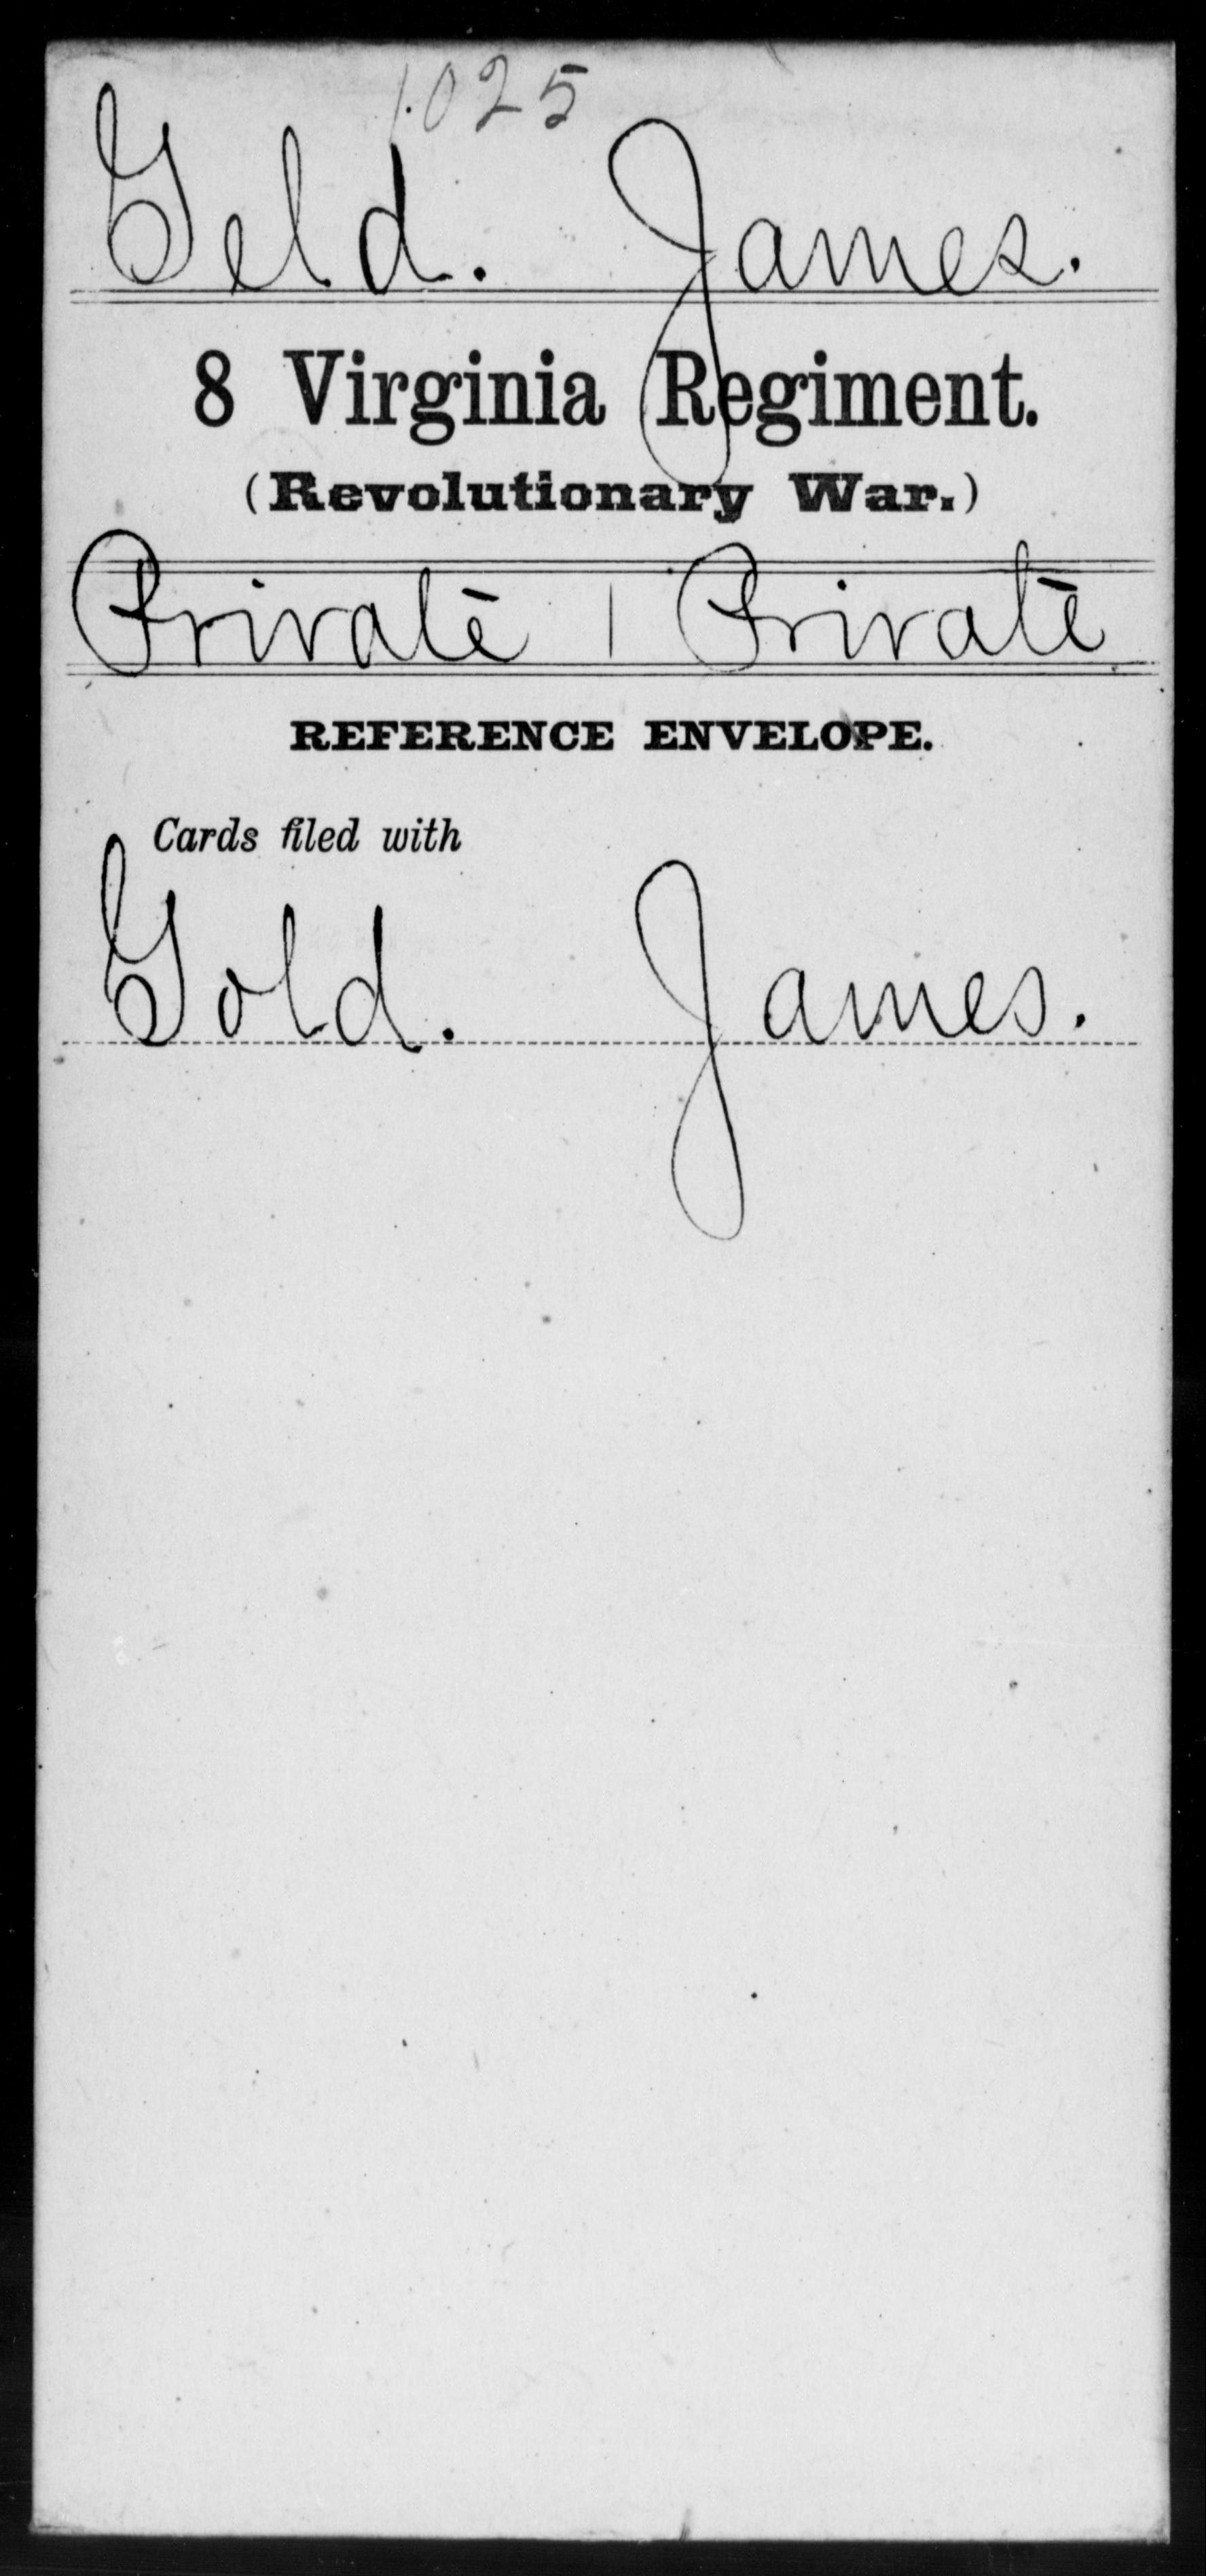 Geld, James - Virginia - Eighth Regiment